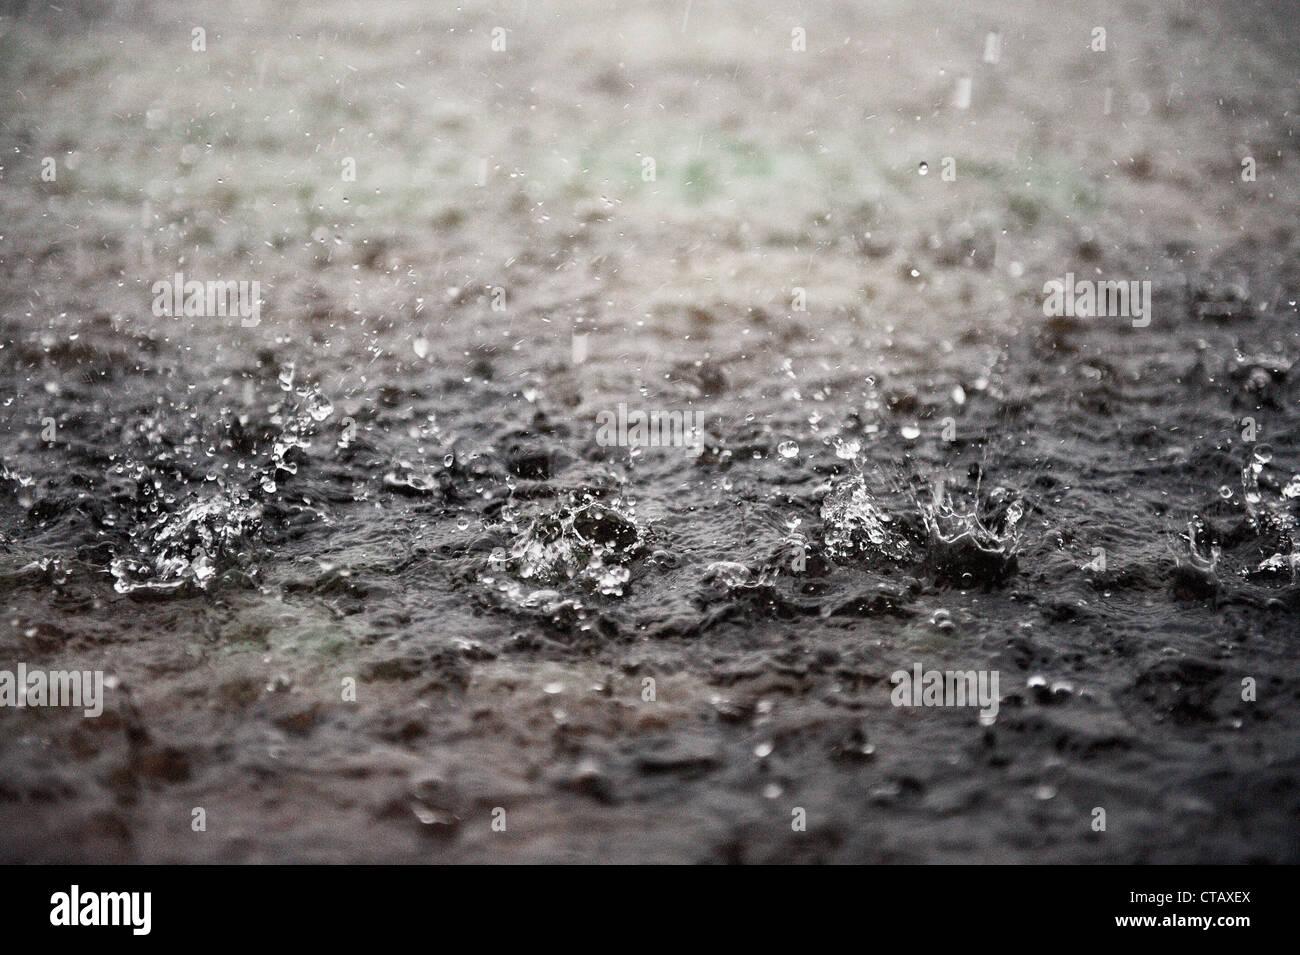 Detail of rain drops during monsoon, Nilaveli, Sri Lanka - Stock Image